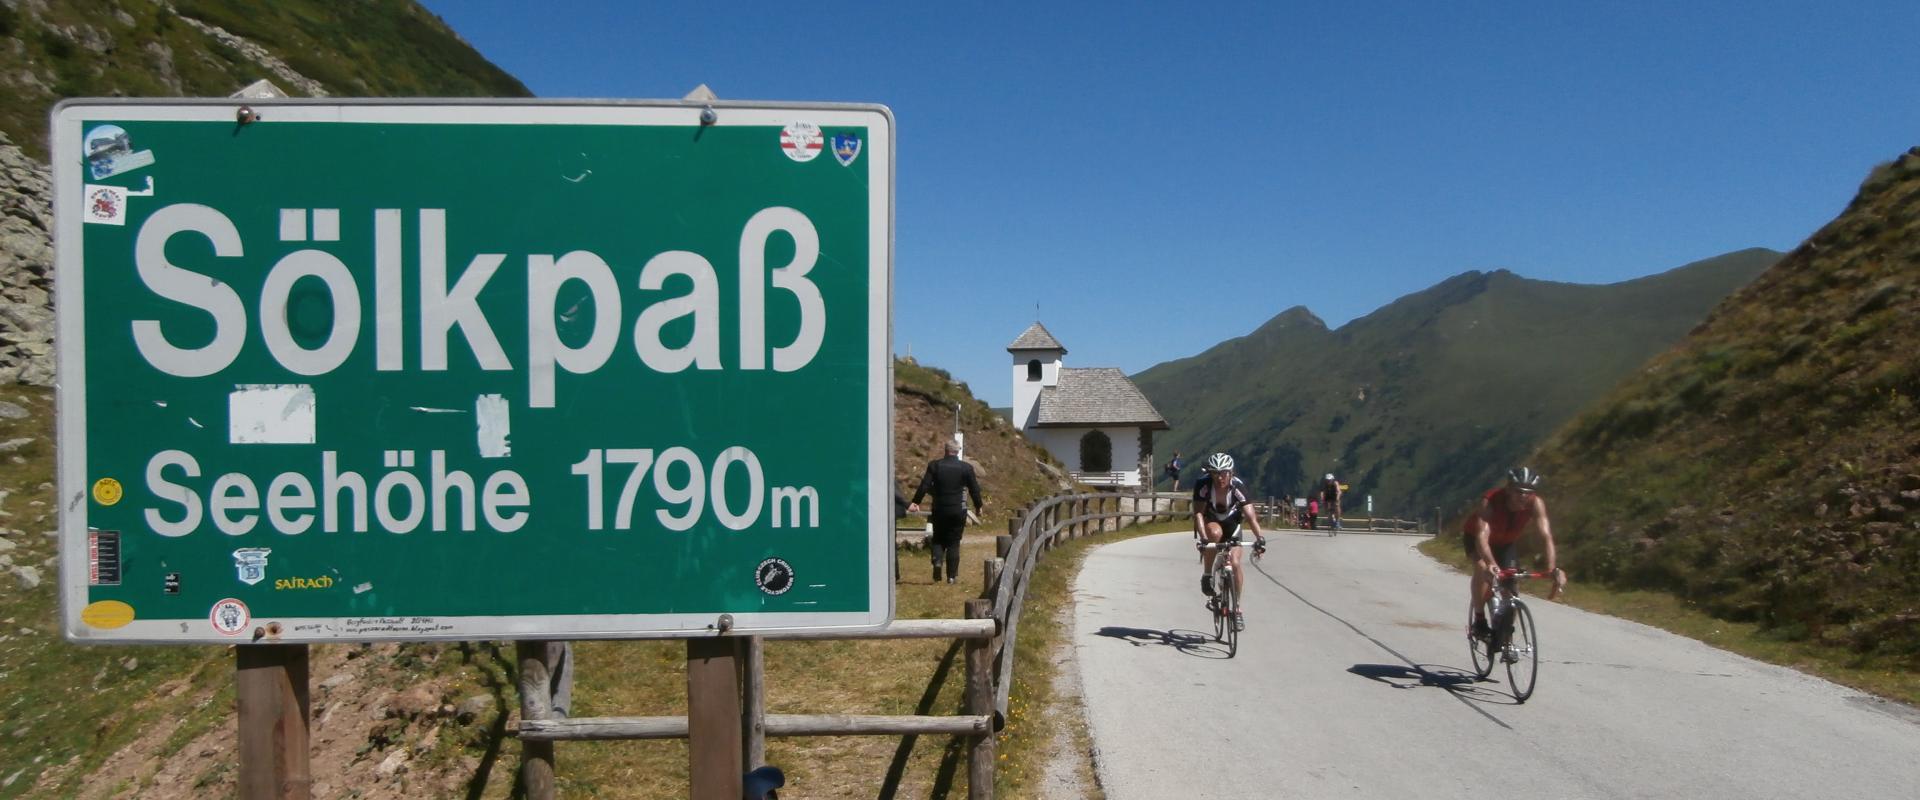 Rennradreise Alpencross Sölkpass